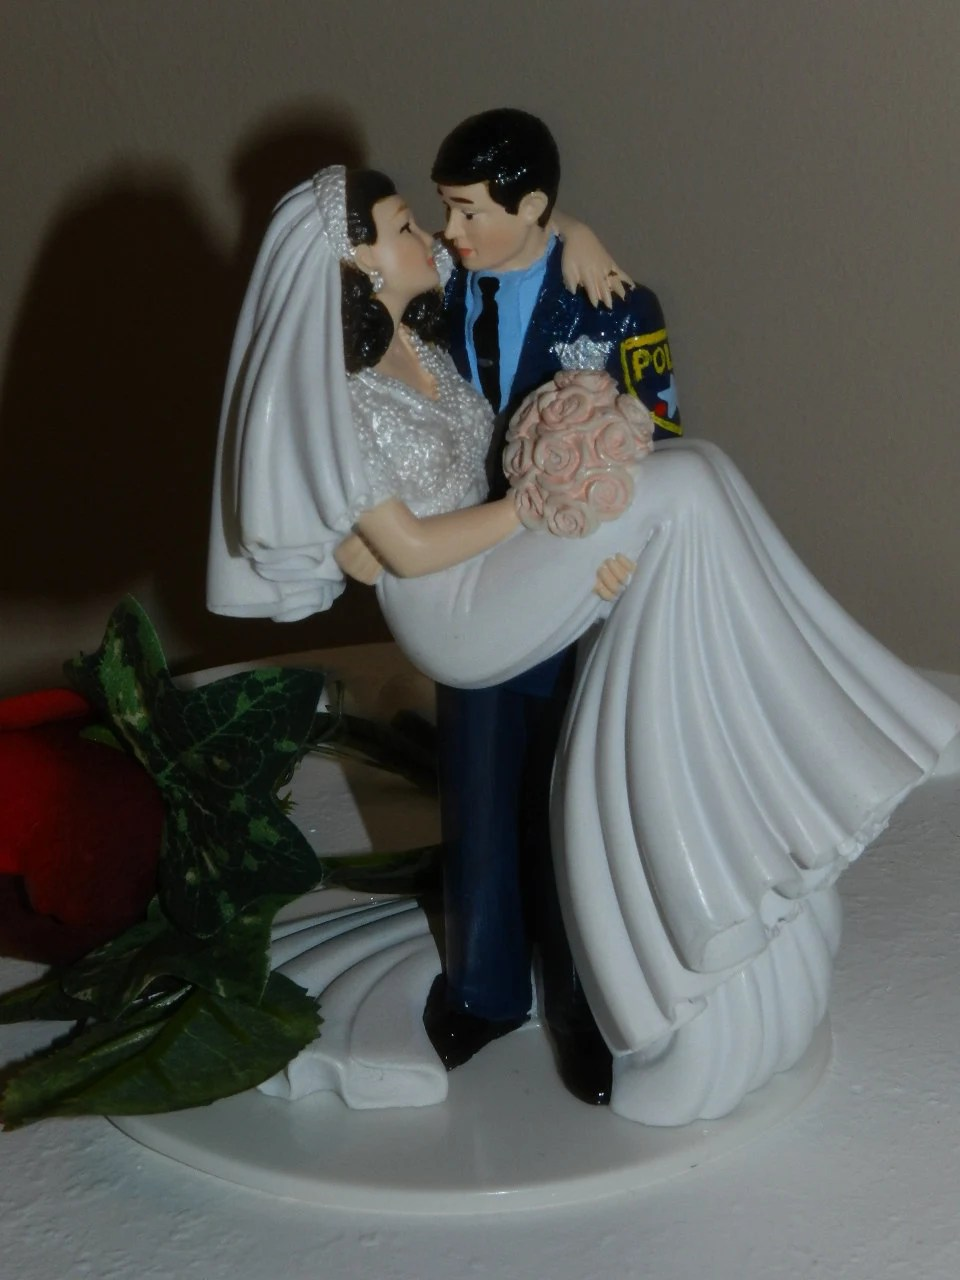 Police Officer Cop Groom Wedding Cake Topper Gun By